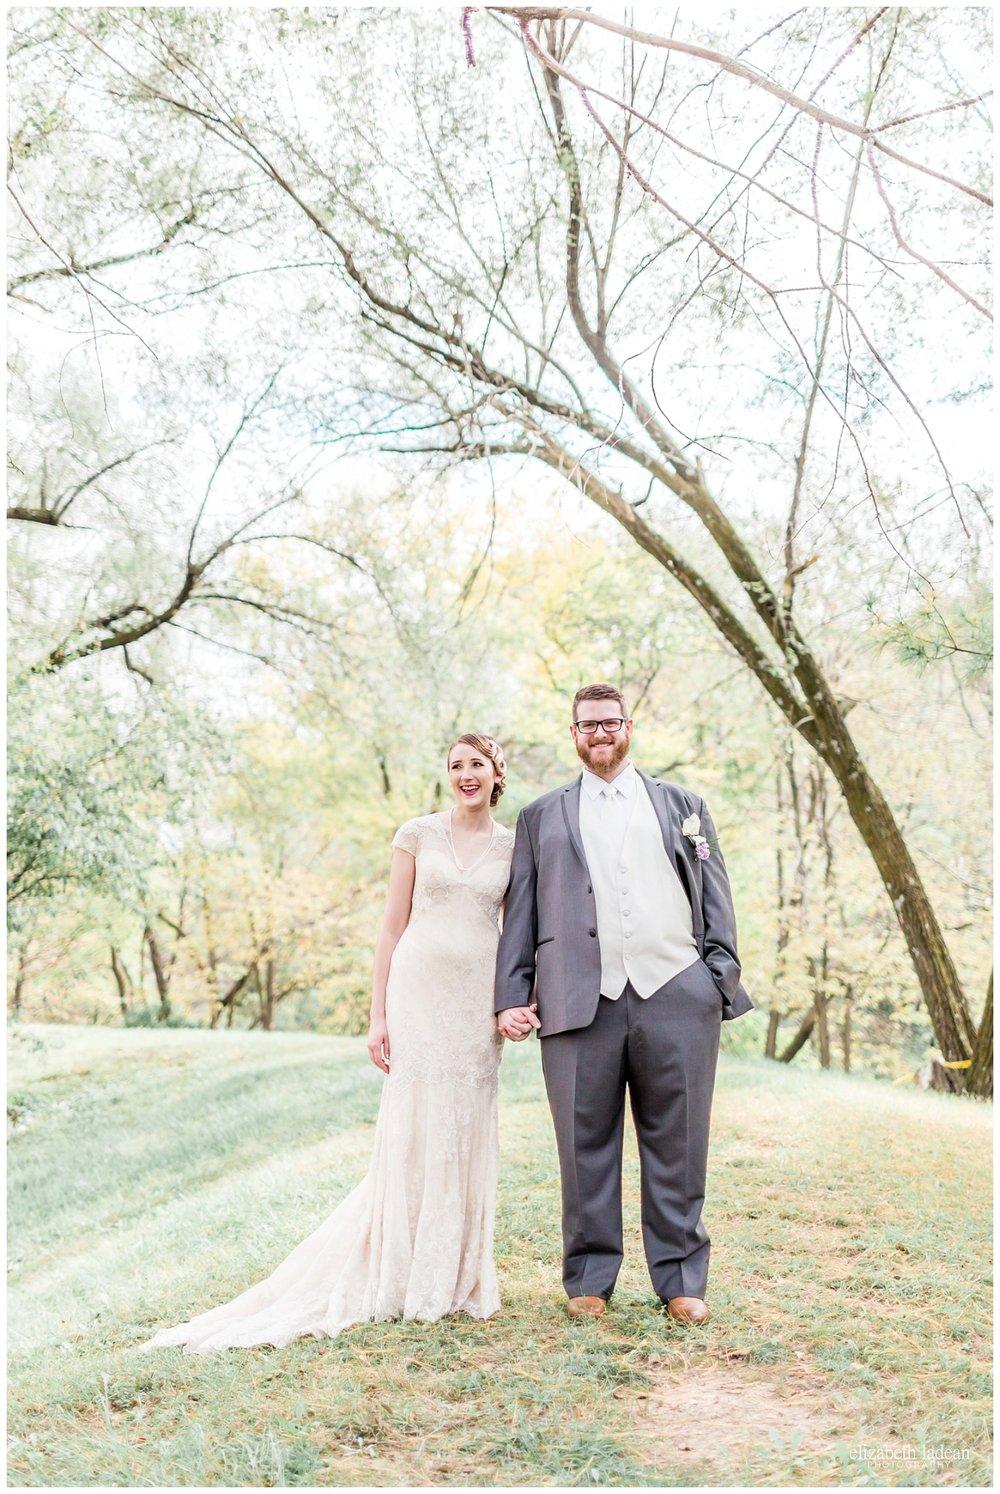 Kansas-City-KC-Wedding-Photographer-2017BestOf-Elizabeth-Ladean-Photography-photo-_6038.jpg